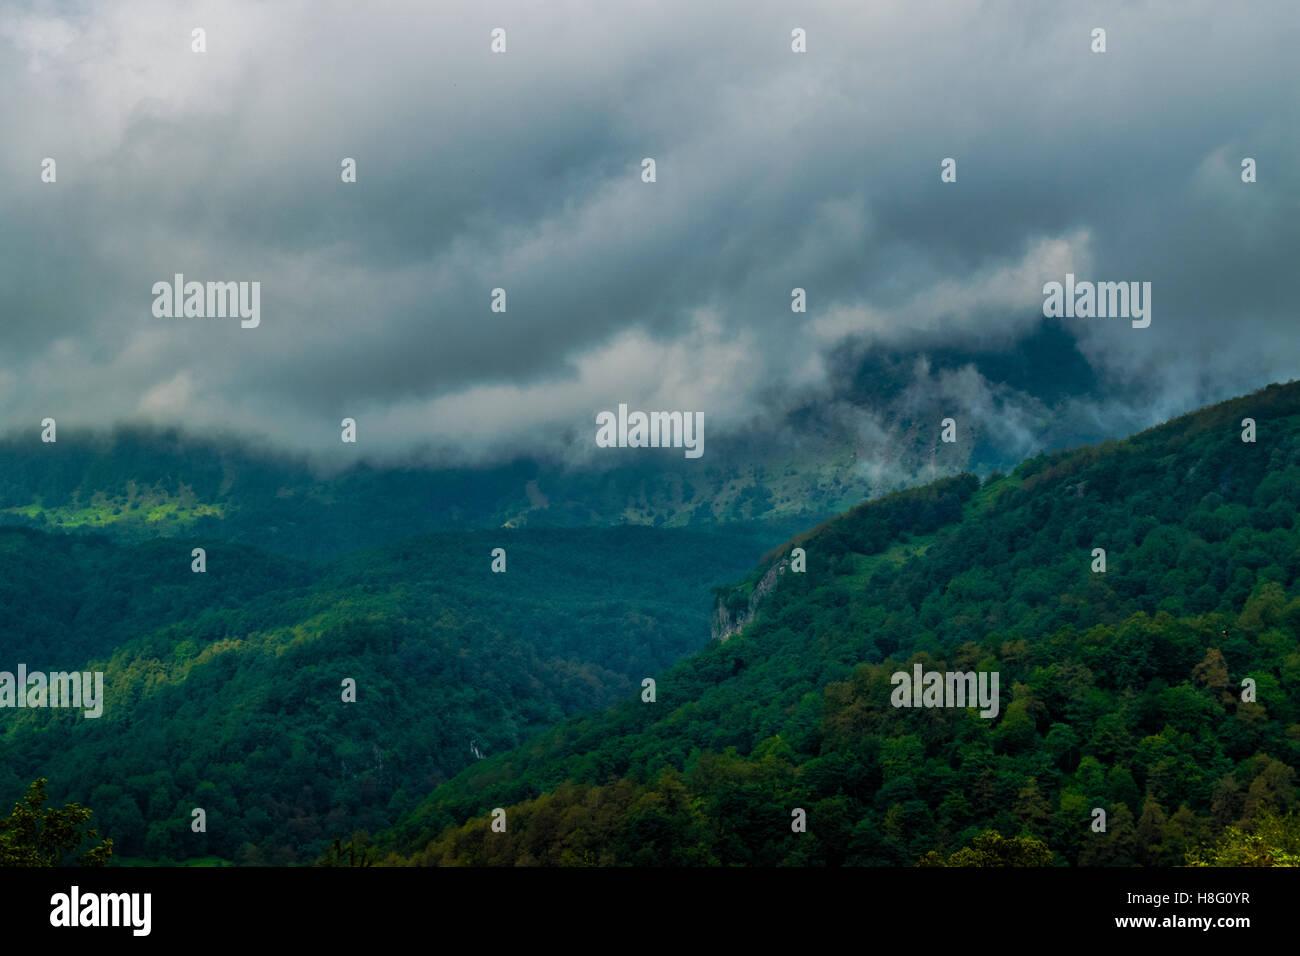 latoon jungles - Stock Image